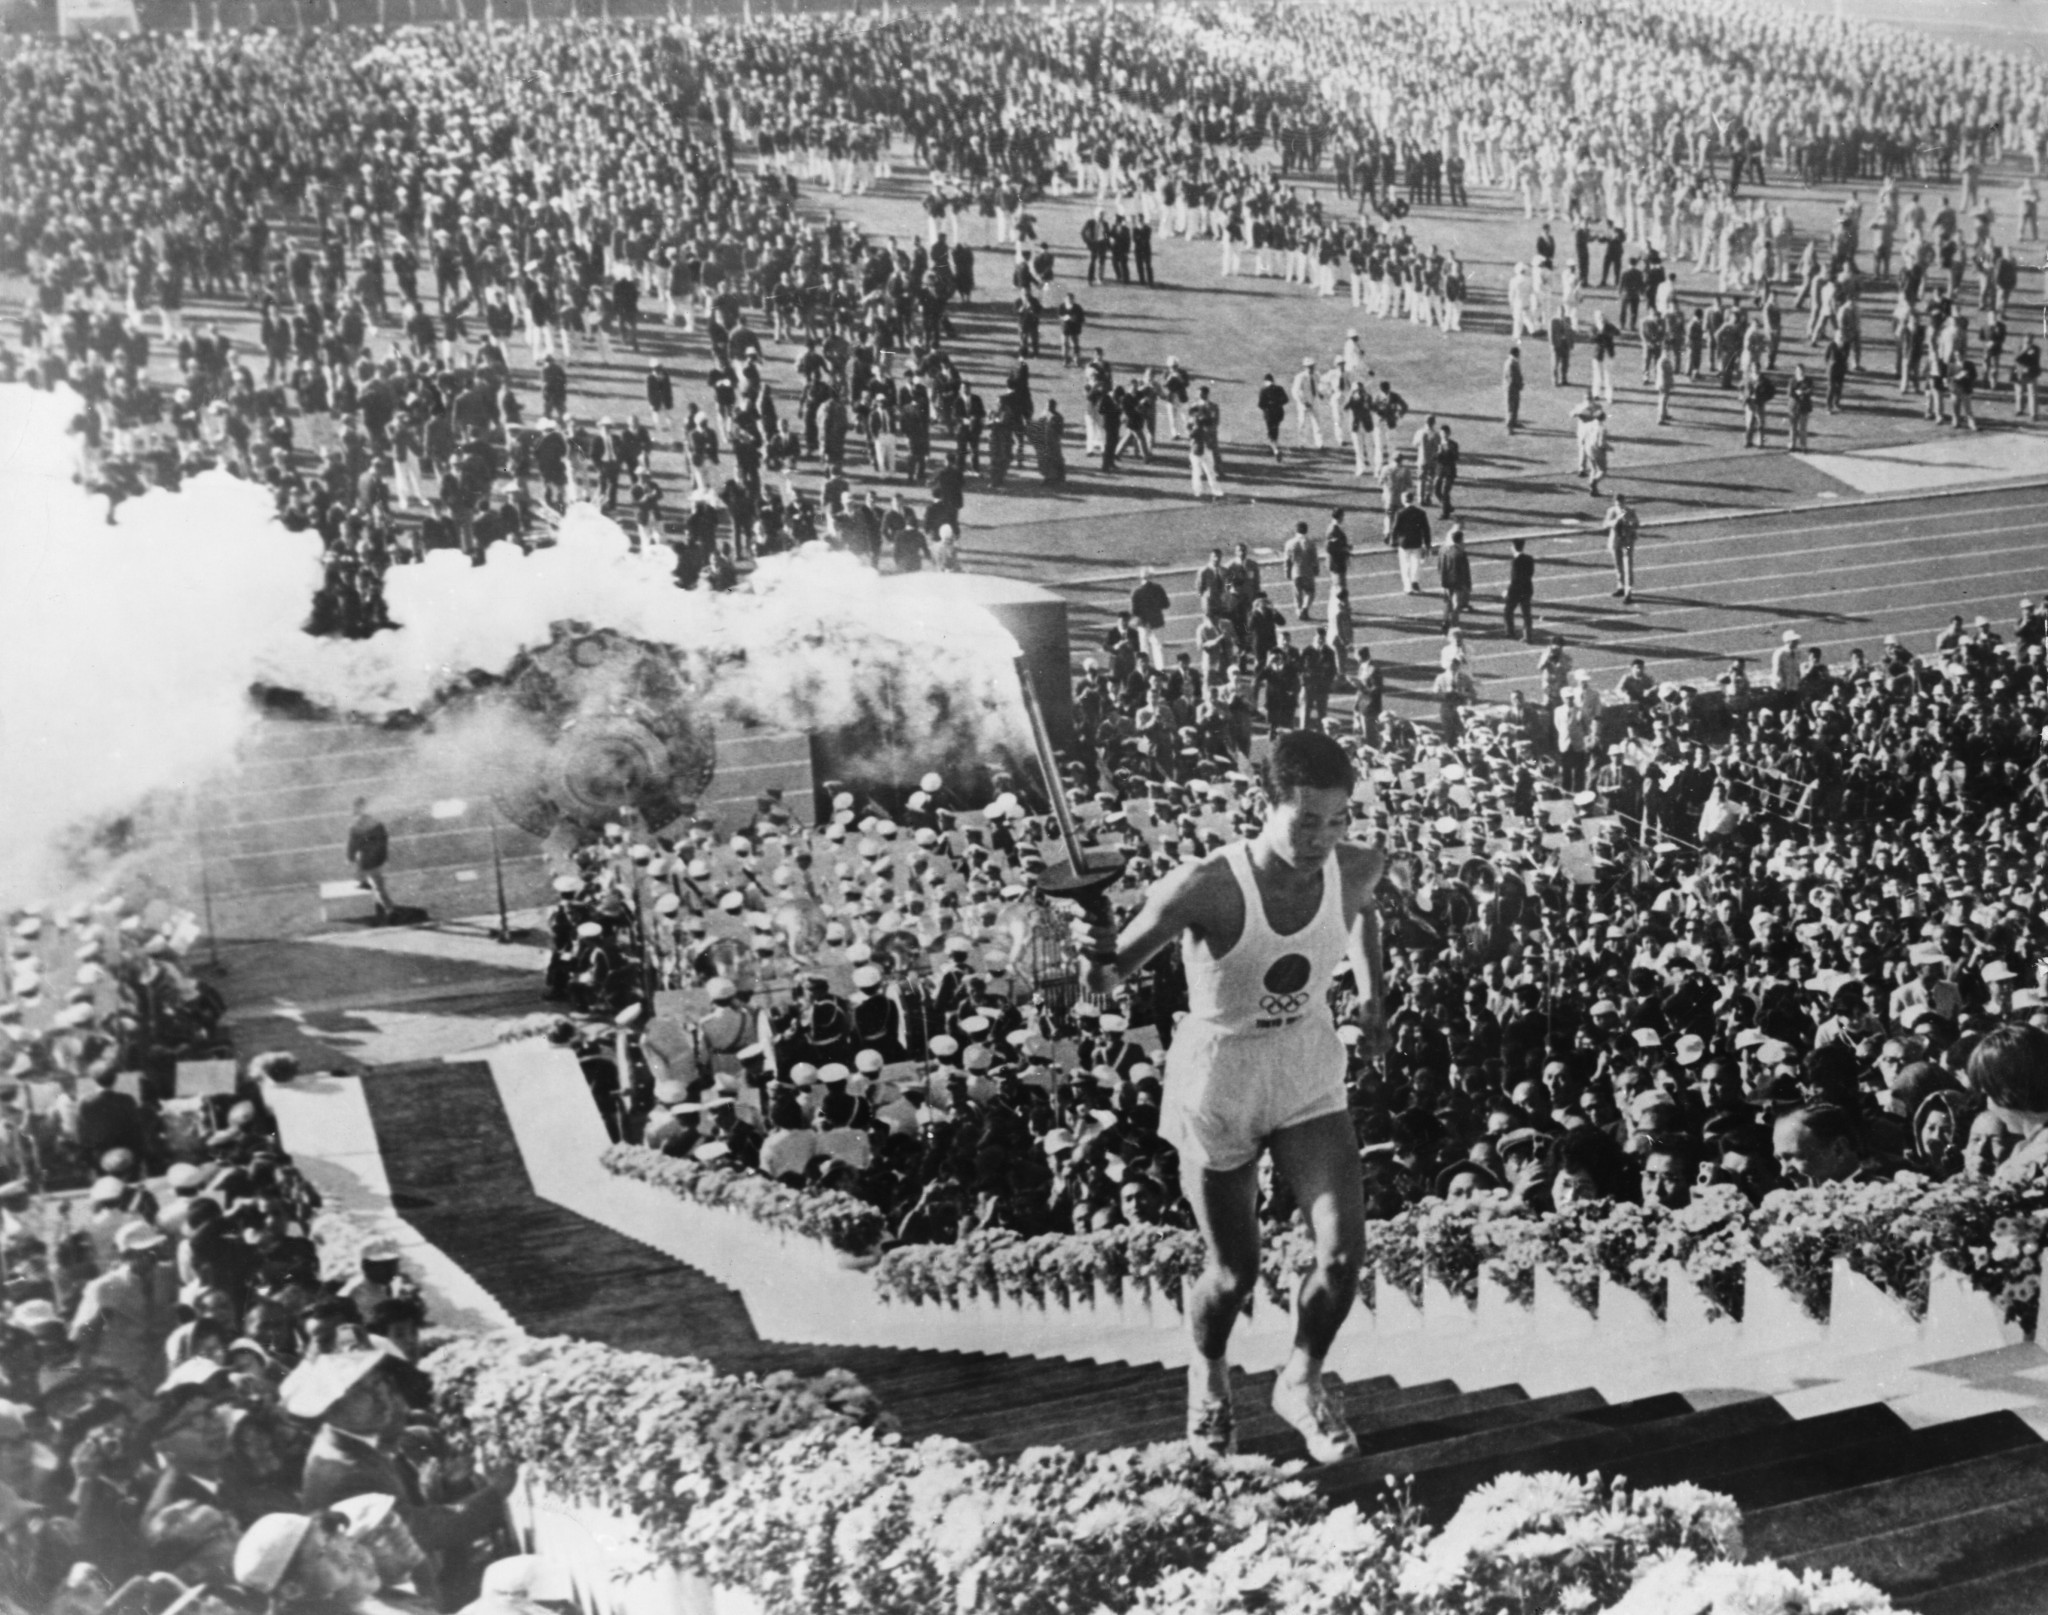 Yoshinori Sakai on his way to lighting the Cauldron to mark the start of the Tokyo 1964 Olympics ©Getty Images